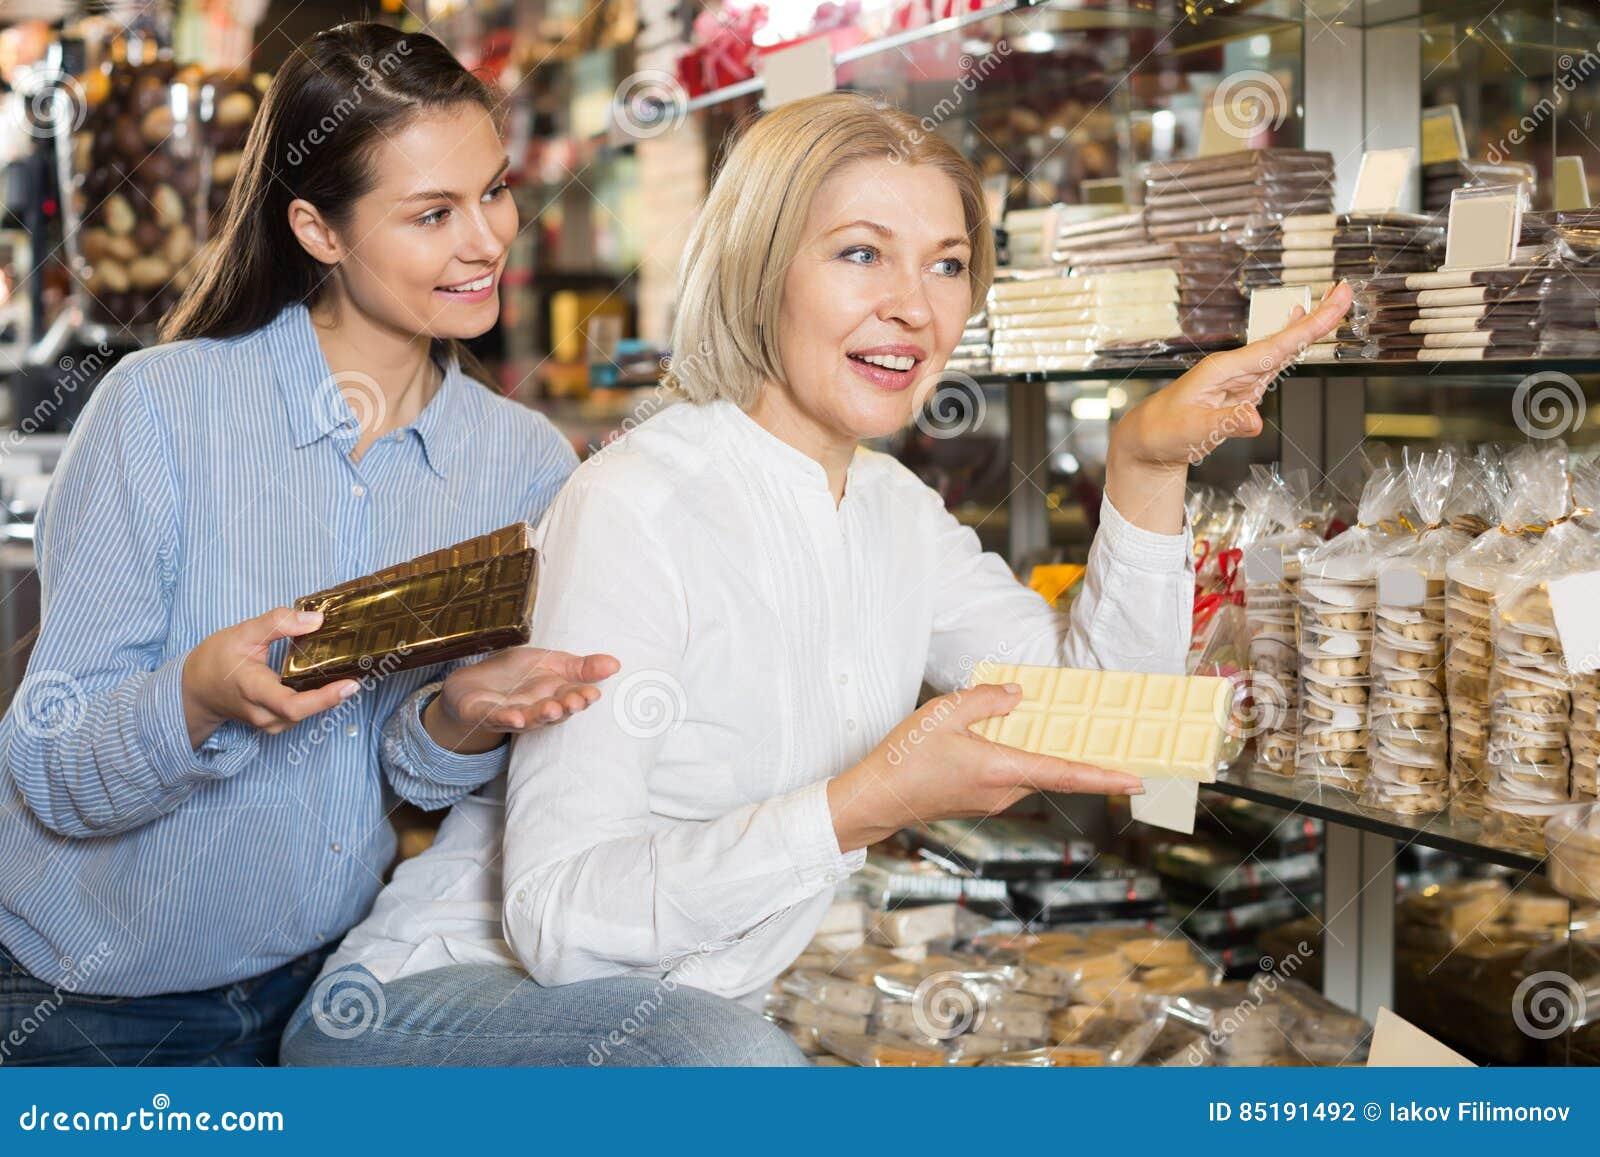 Ordinary female customers selecting chocolate